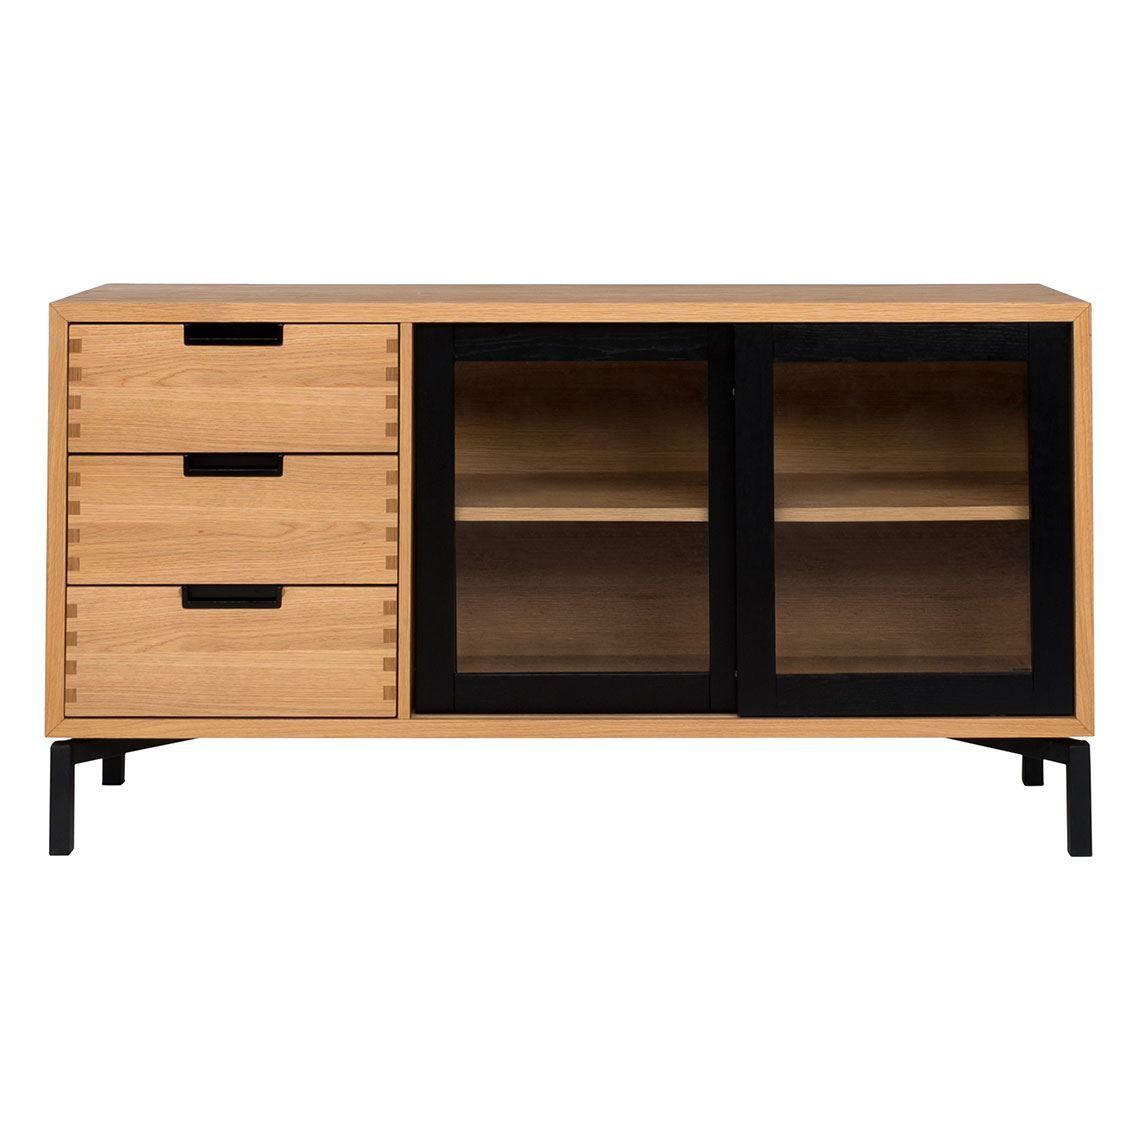 atelier 2 door 3 drawer buffet black oak products pinterest rh pinterest com